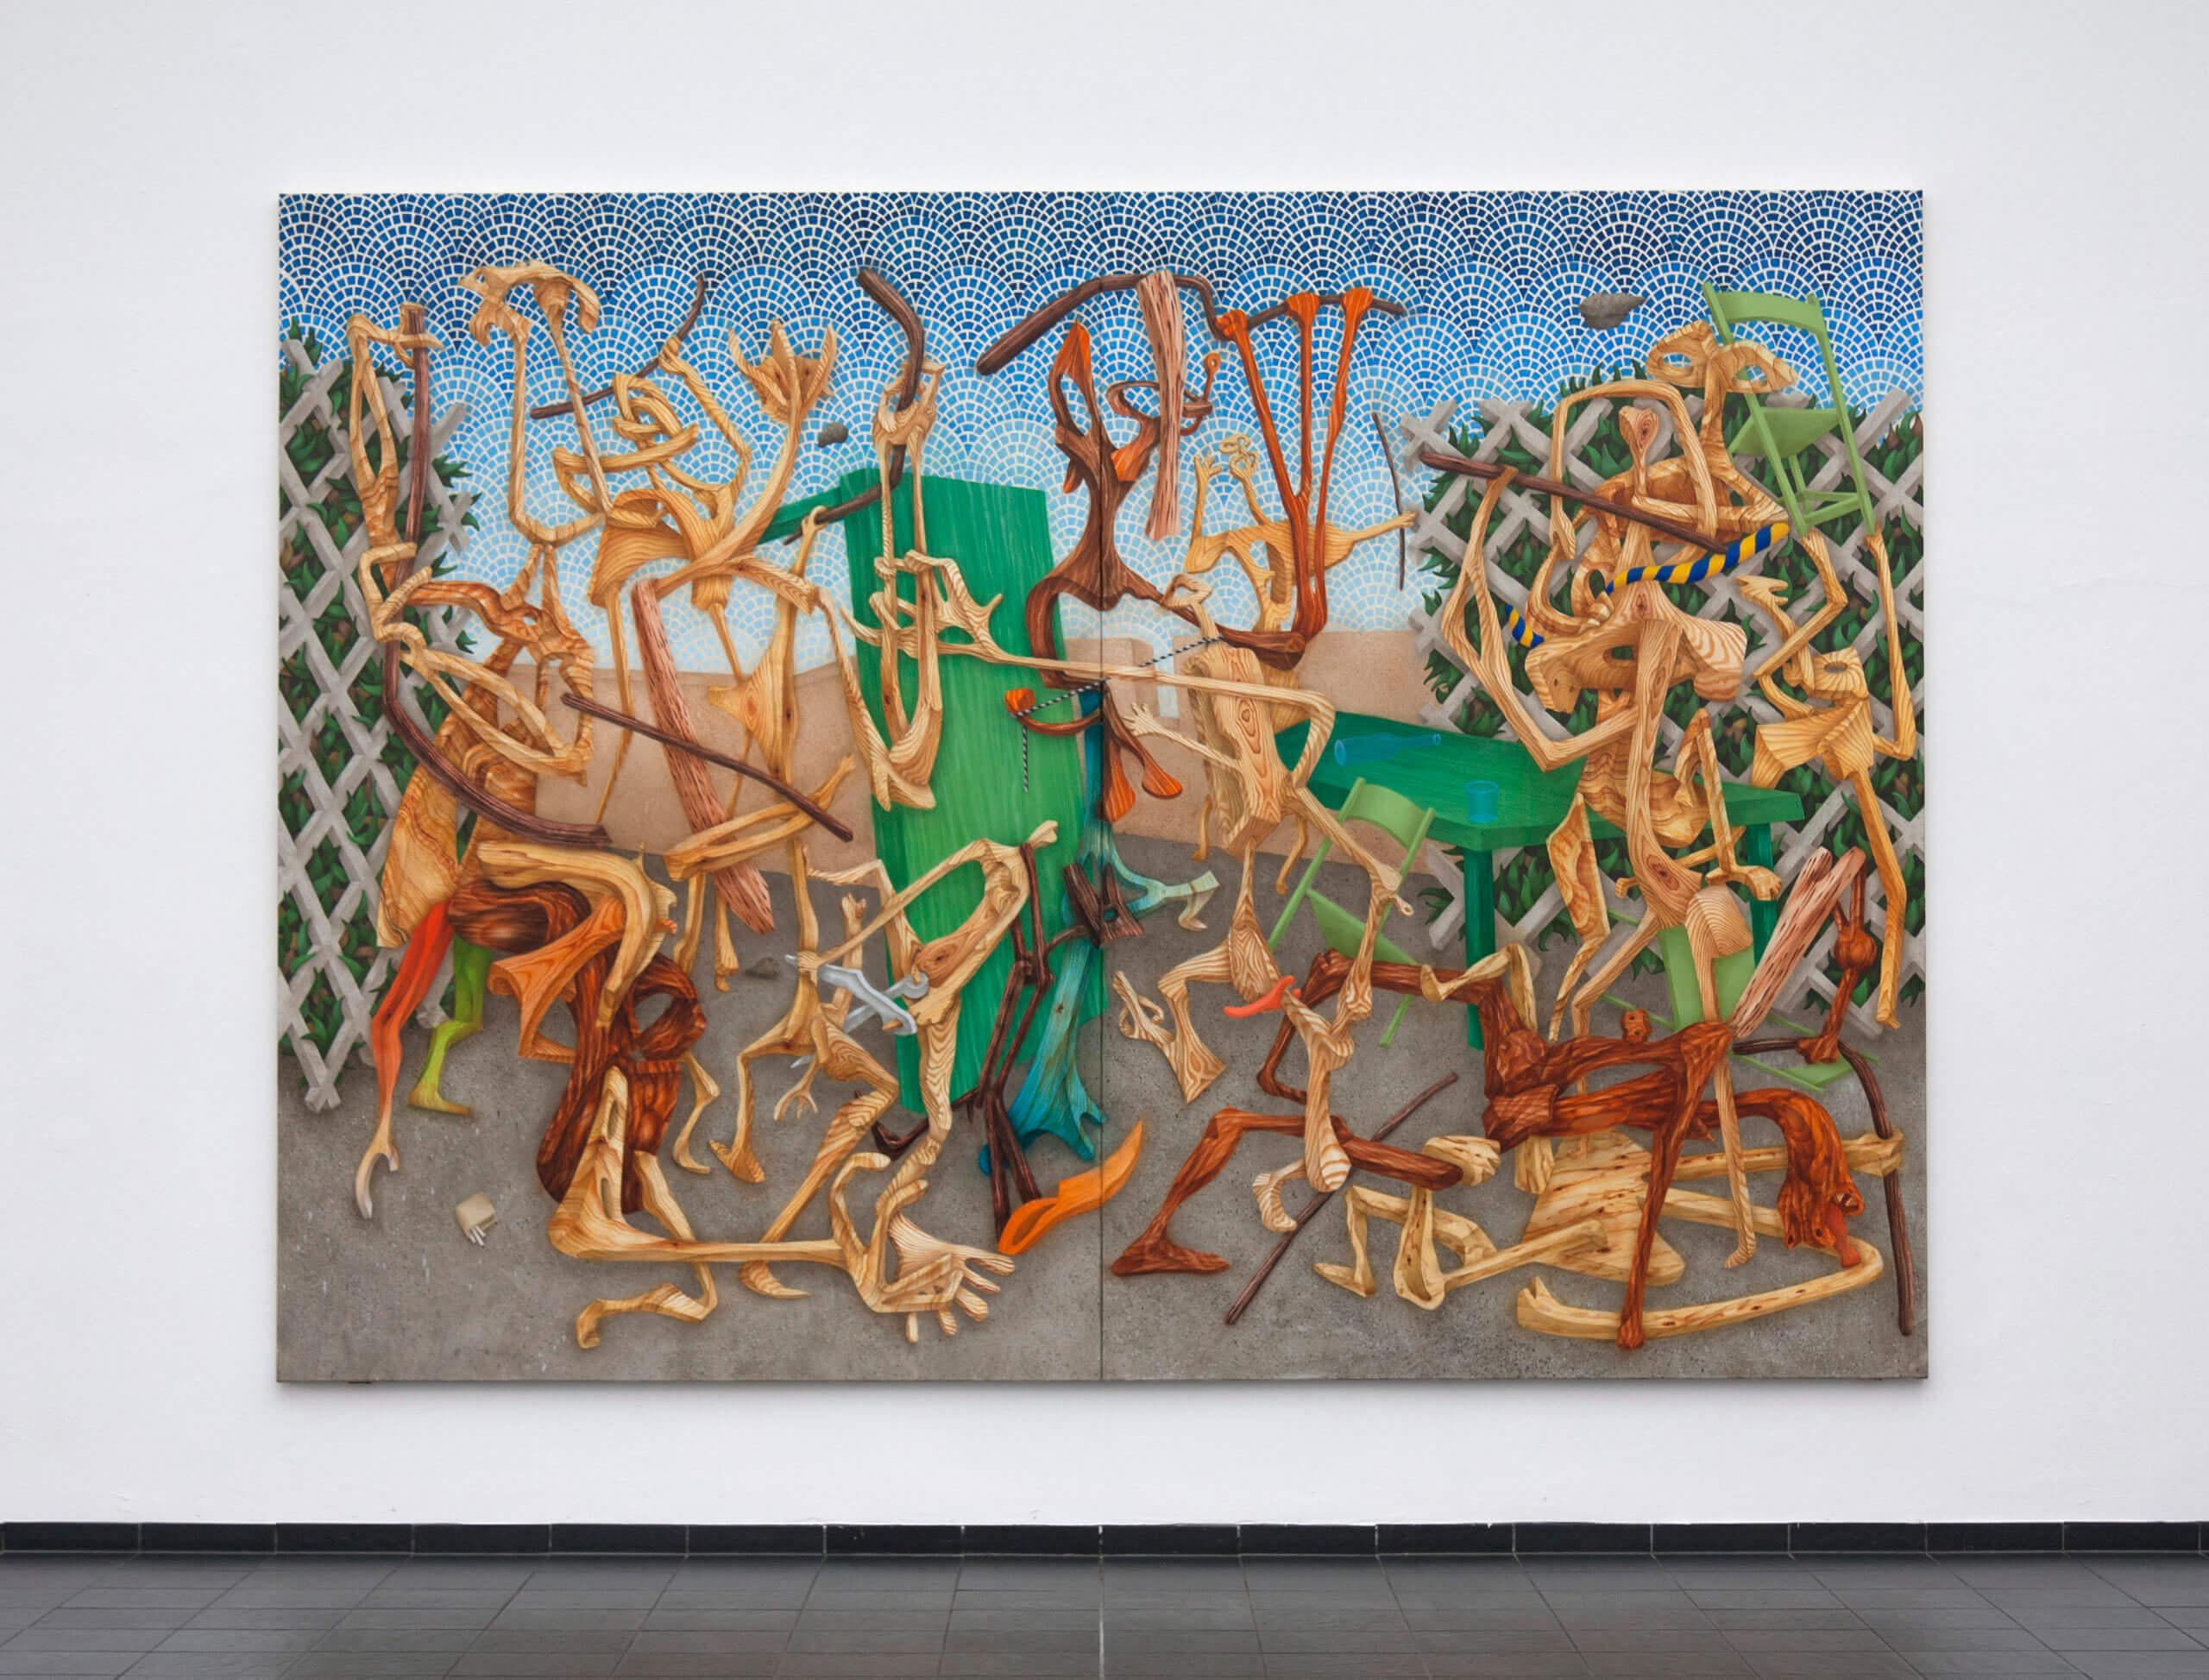 »Baton blows« 260 x 360 cm Oil on canvas 2018